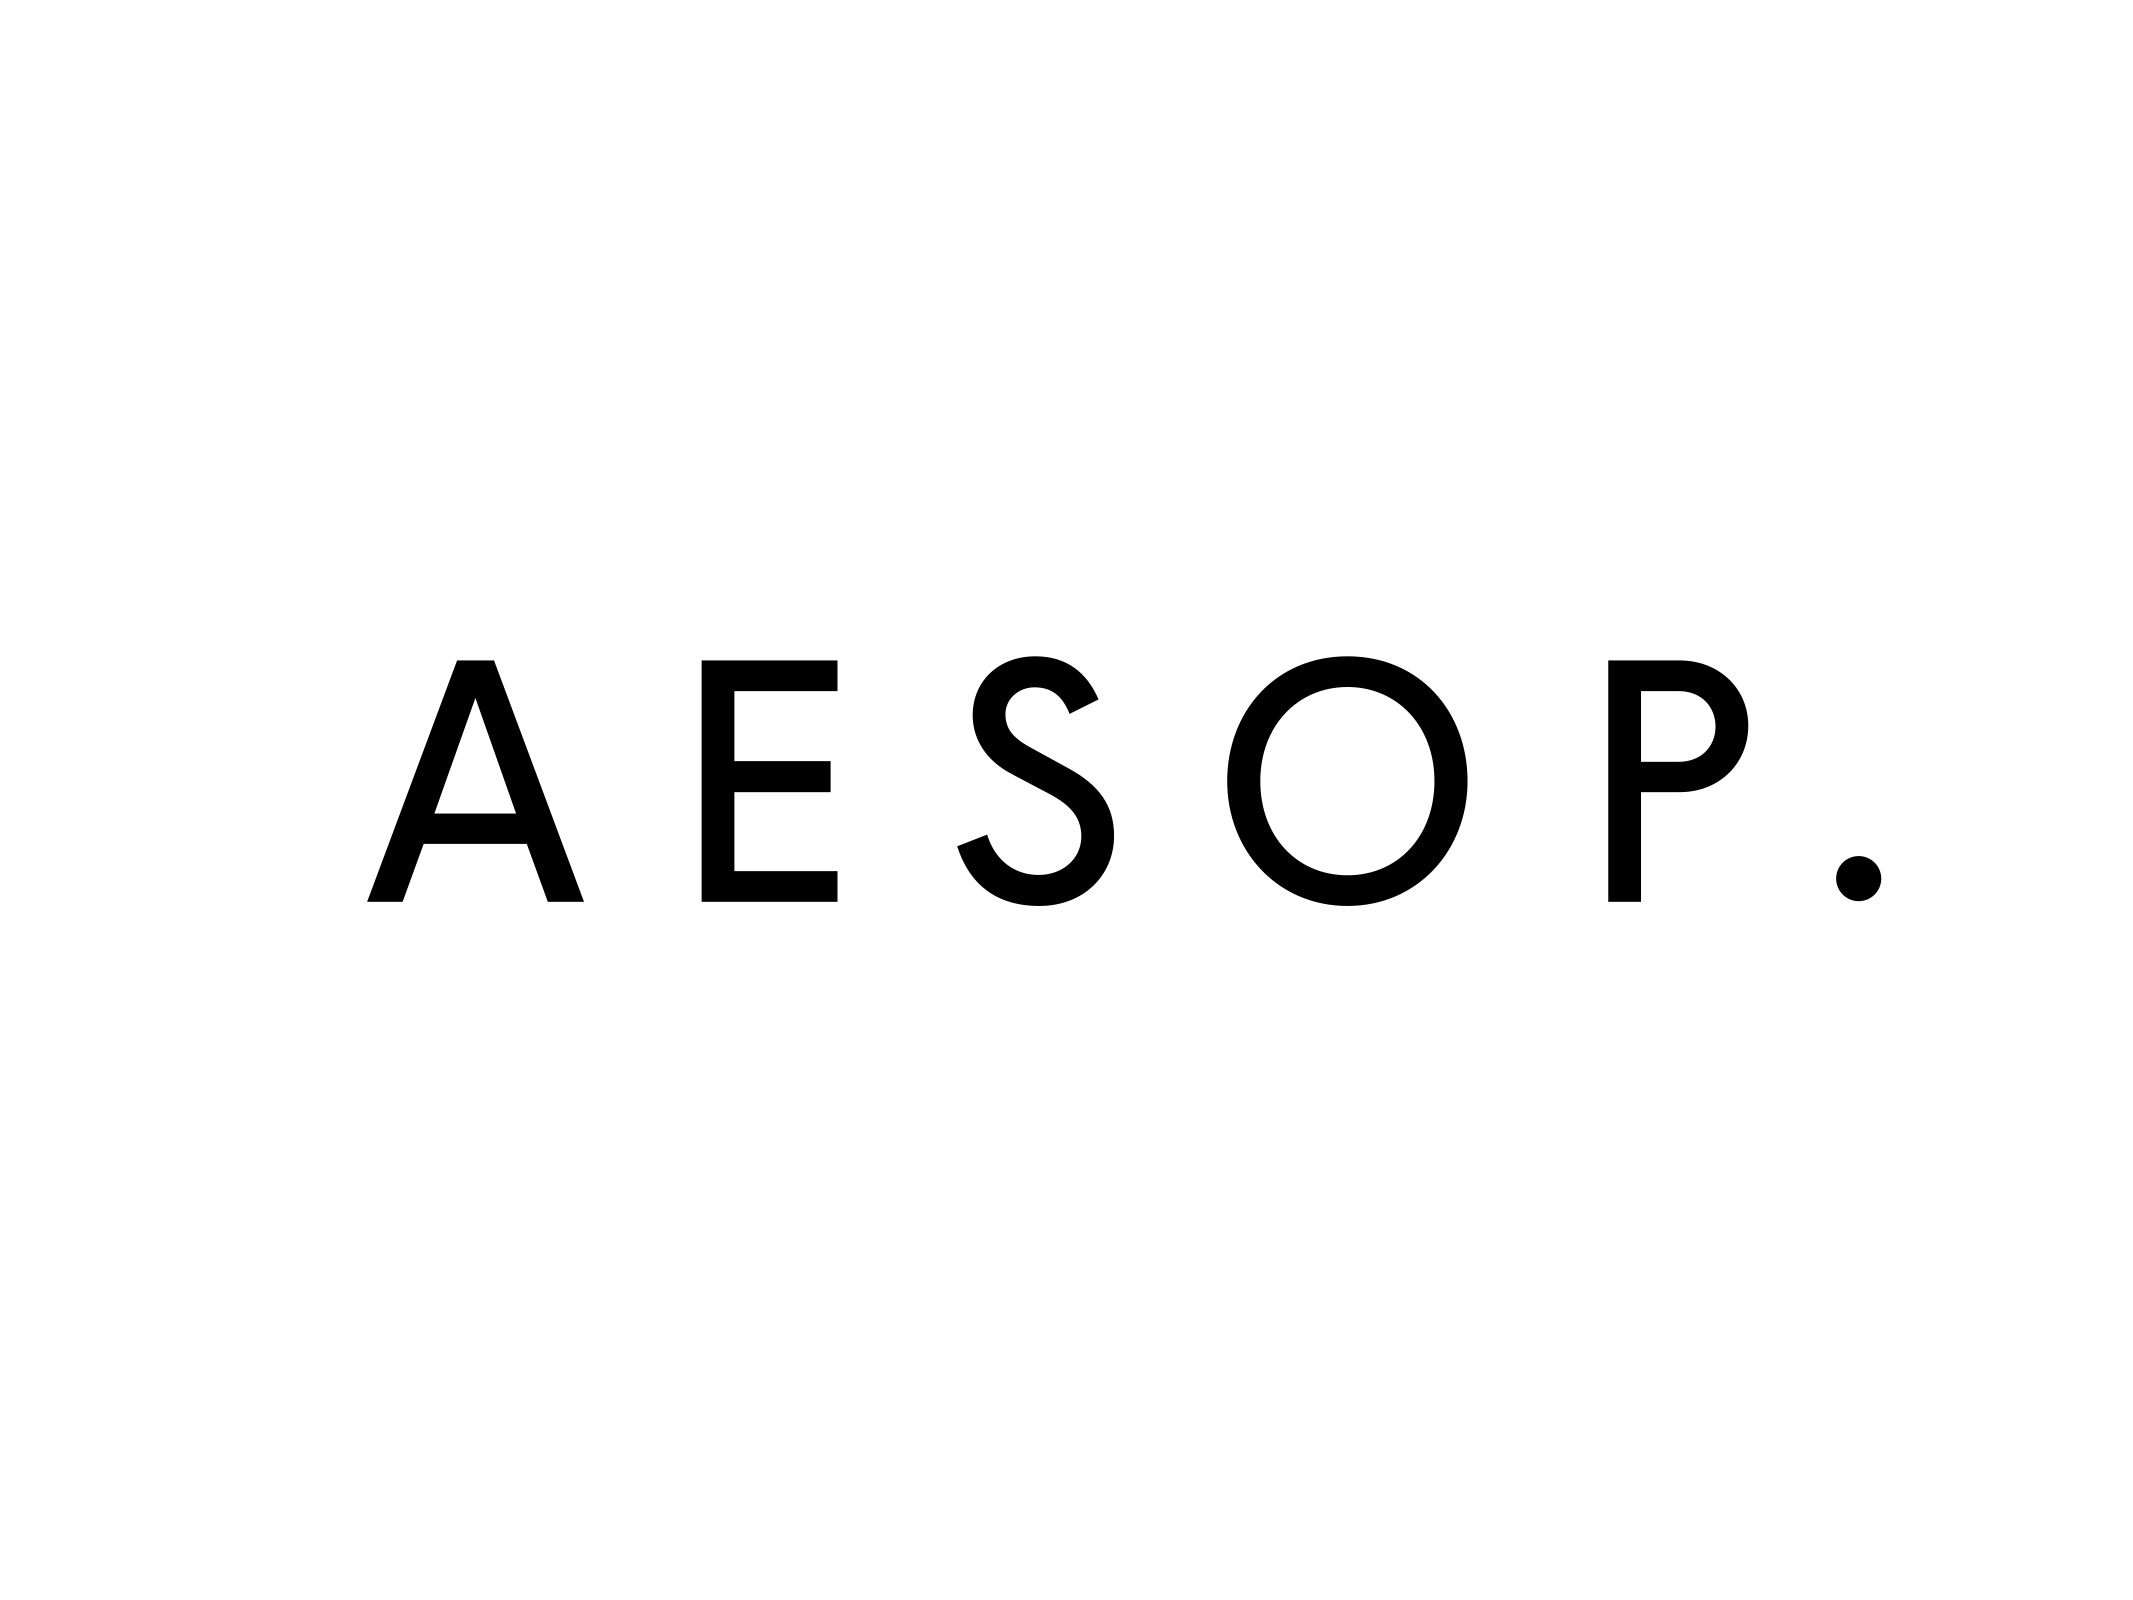 Aesop_Logo_Type.jpg